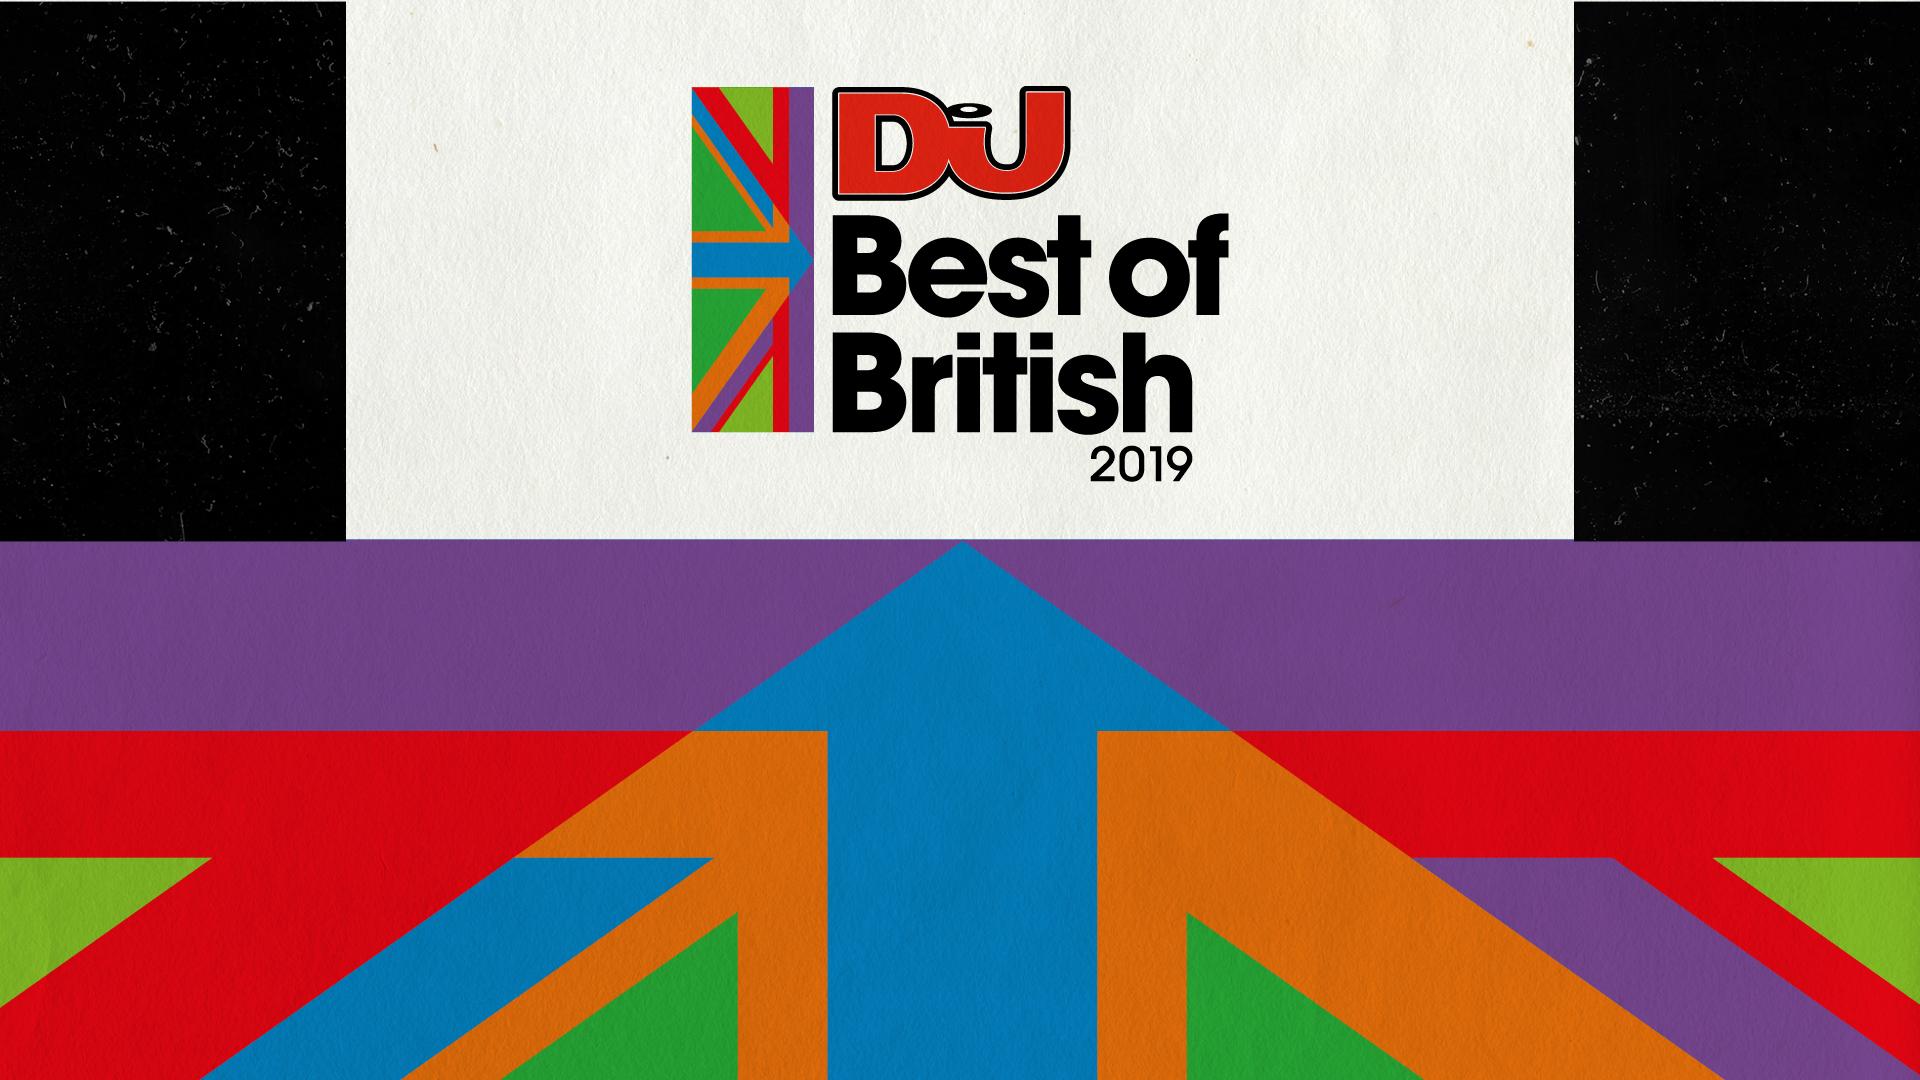 DJ Mag Best of British Awards 2019: Voting is now open